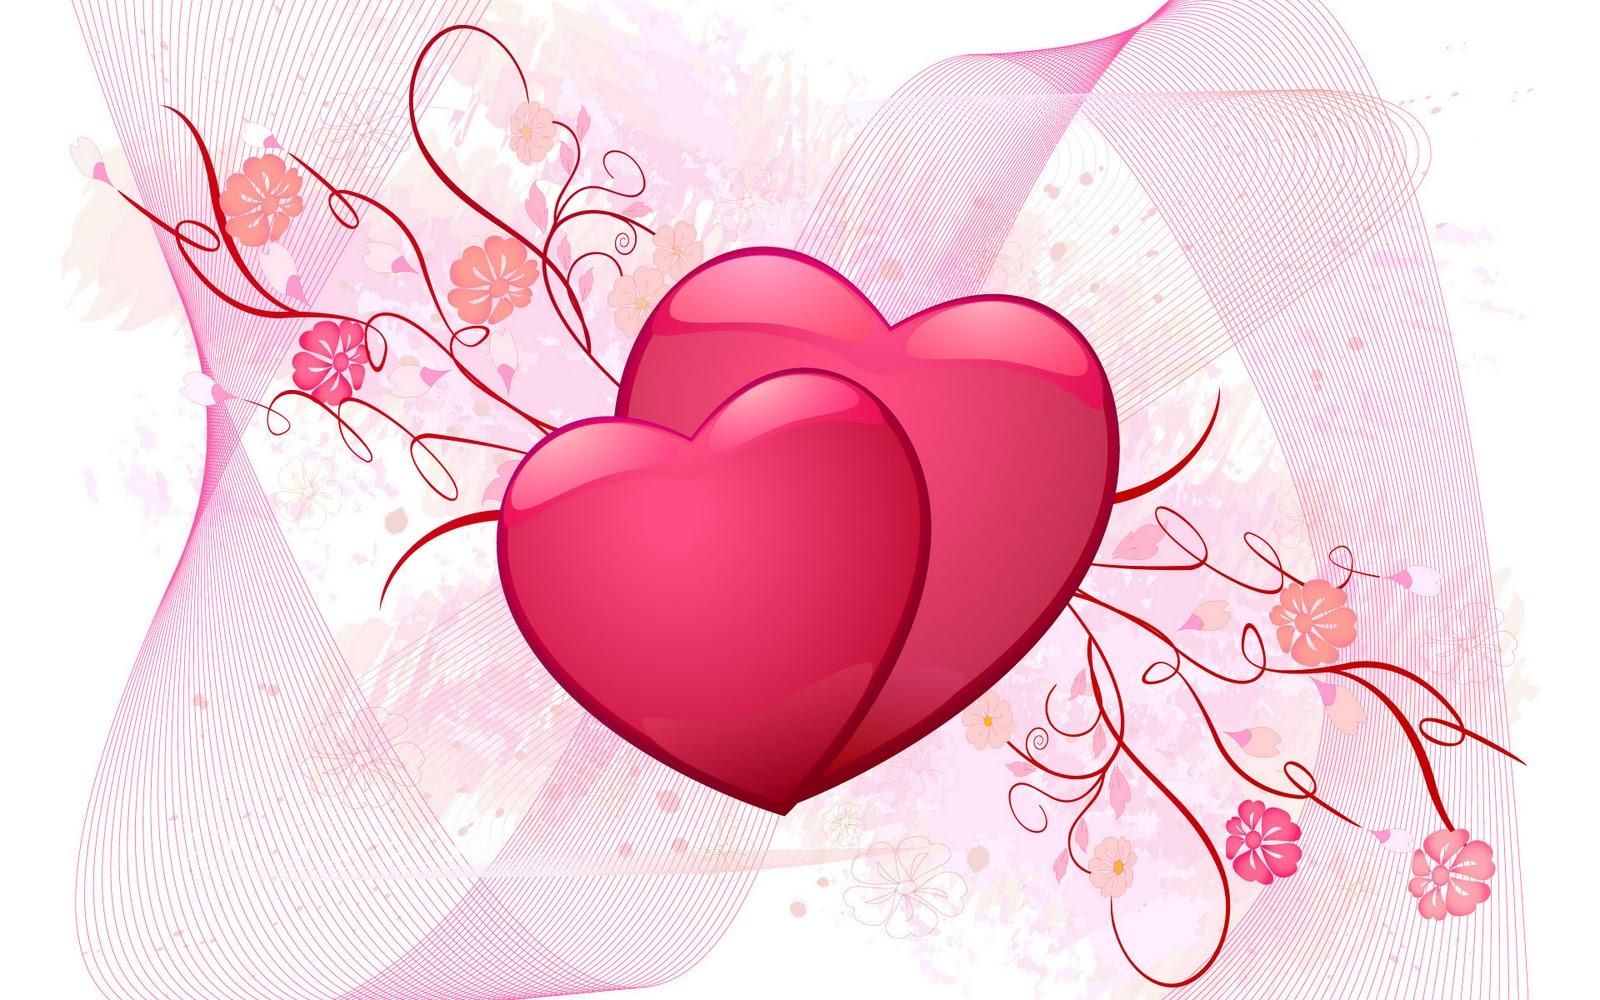 http://2.bp.blogspot.com/_7U5a9J1zONs/TTk2FjJgotI/AAAAAAAAAEY/xrK0M1NkCFY/s1600/Love-wallpaper-love-4187609-1920-1200.jpg